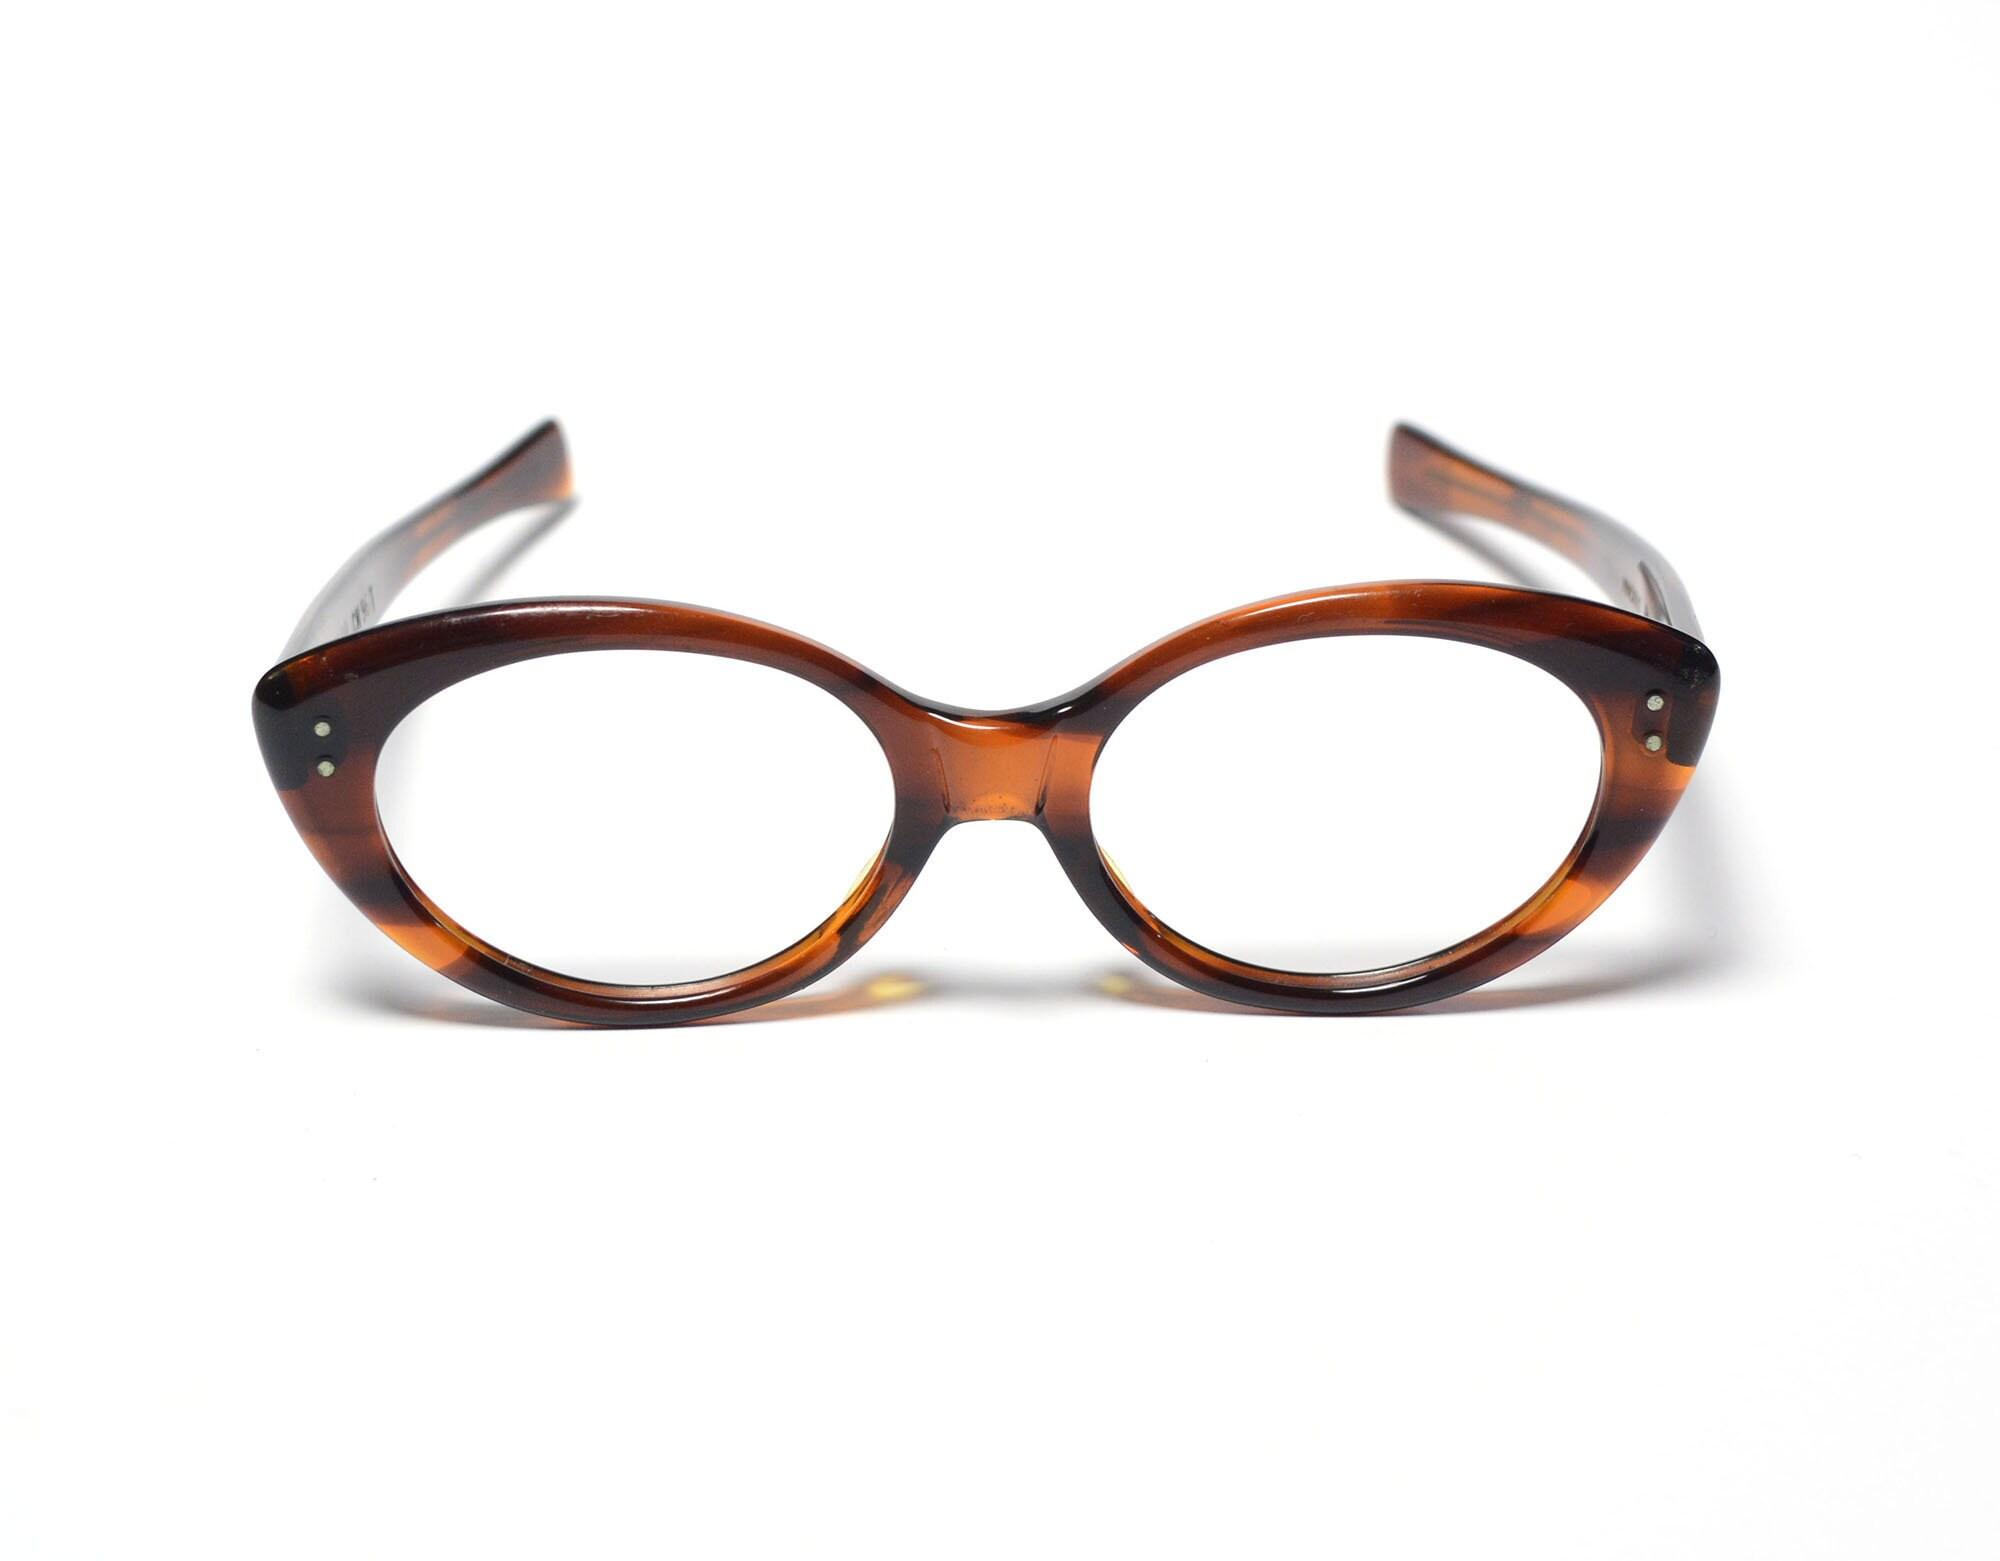 ff74584999a40 Vintage eyewear 60s cat eye glasses retro oval eyeglasses